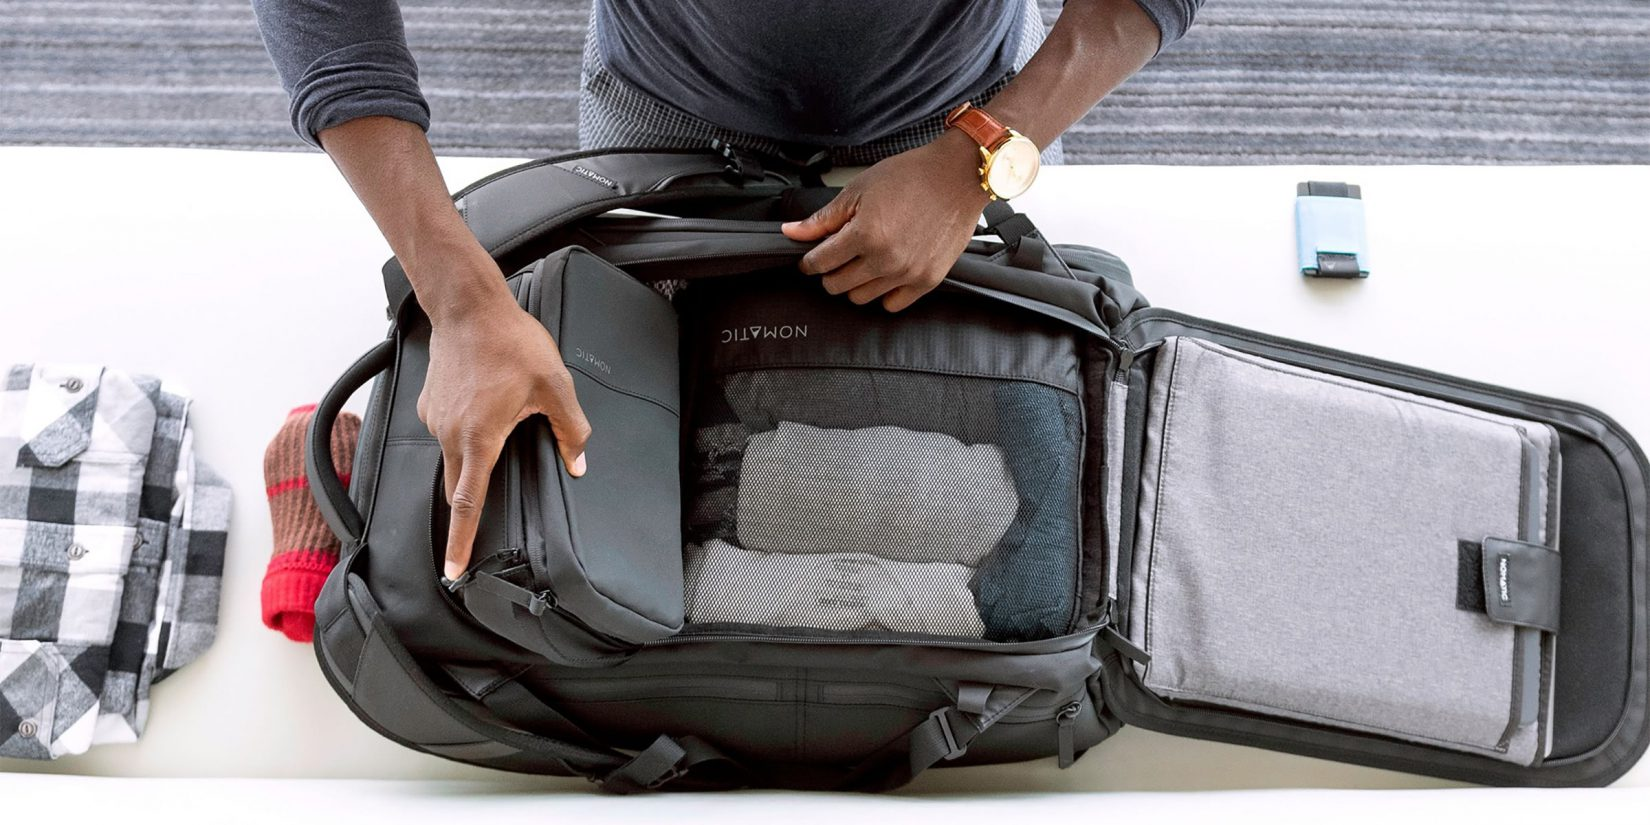 Pack Smart: 9 Best Travel Backpacks for Ultimate Wanderlust